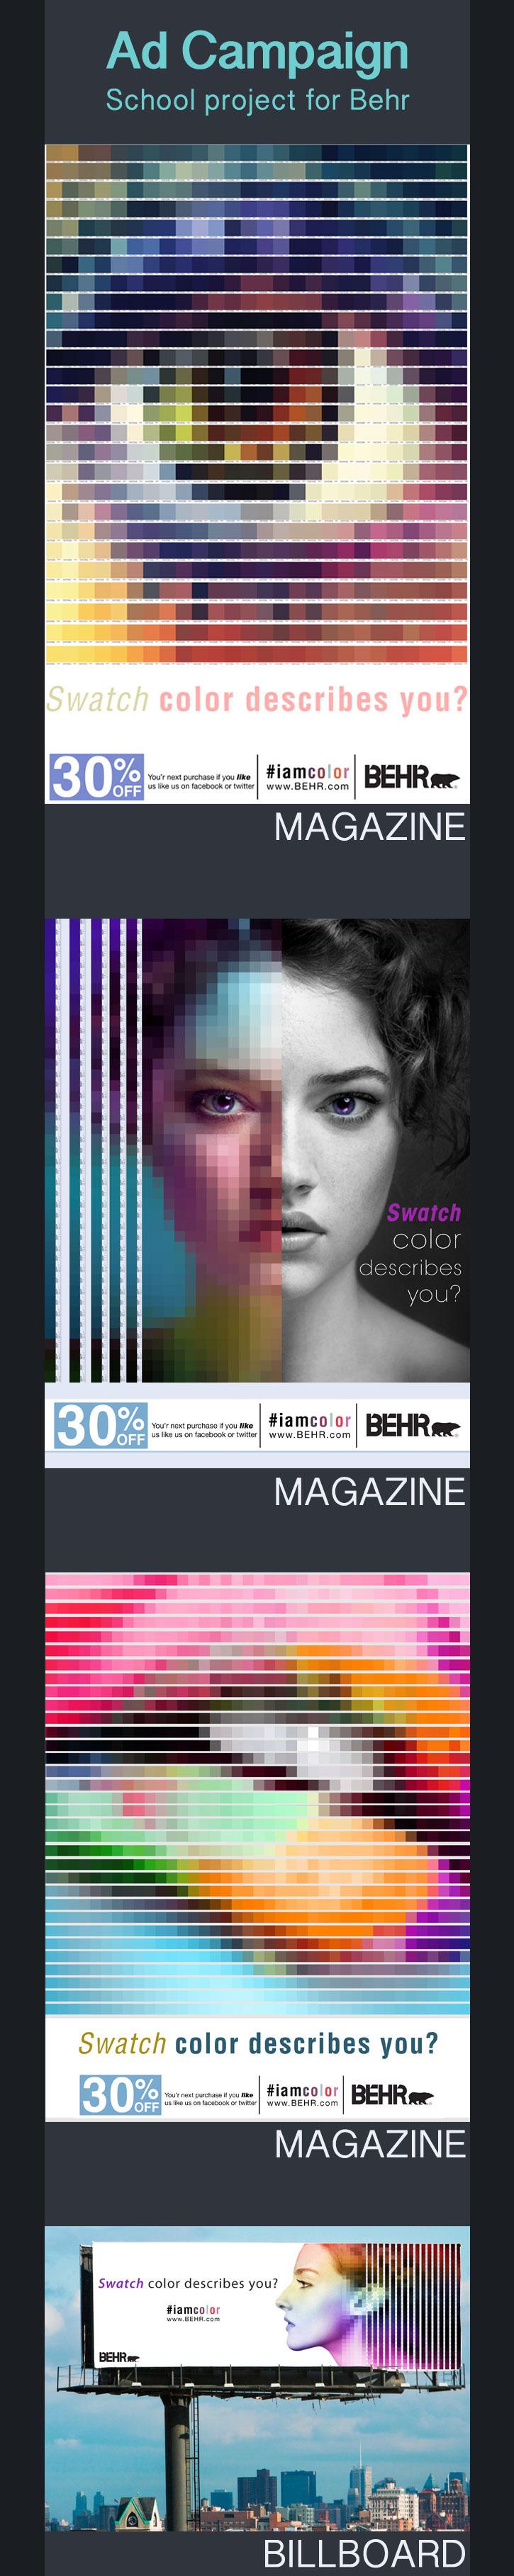 swatch color design magazine ad eye paint